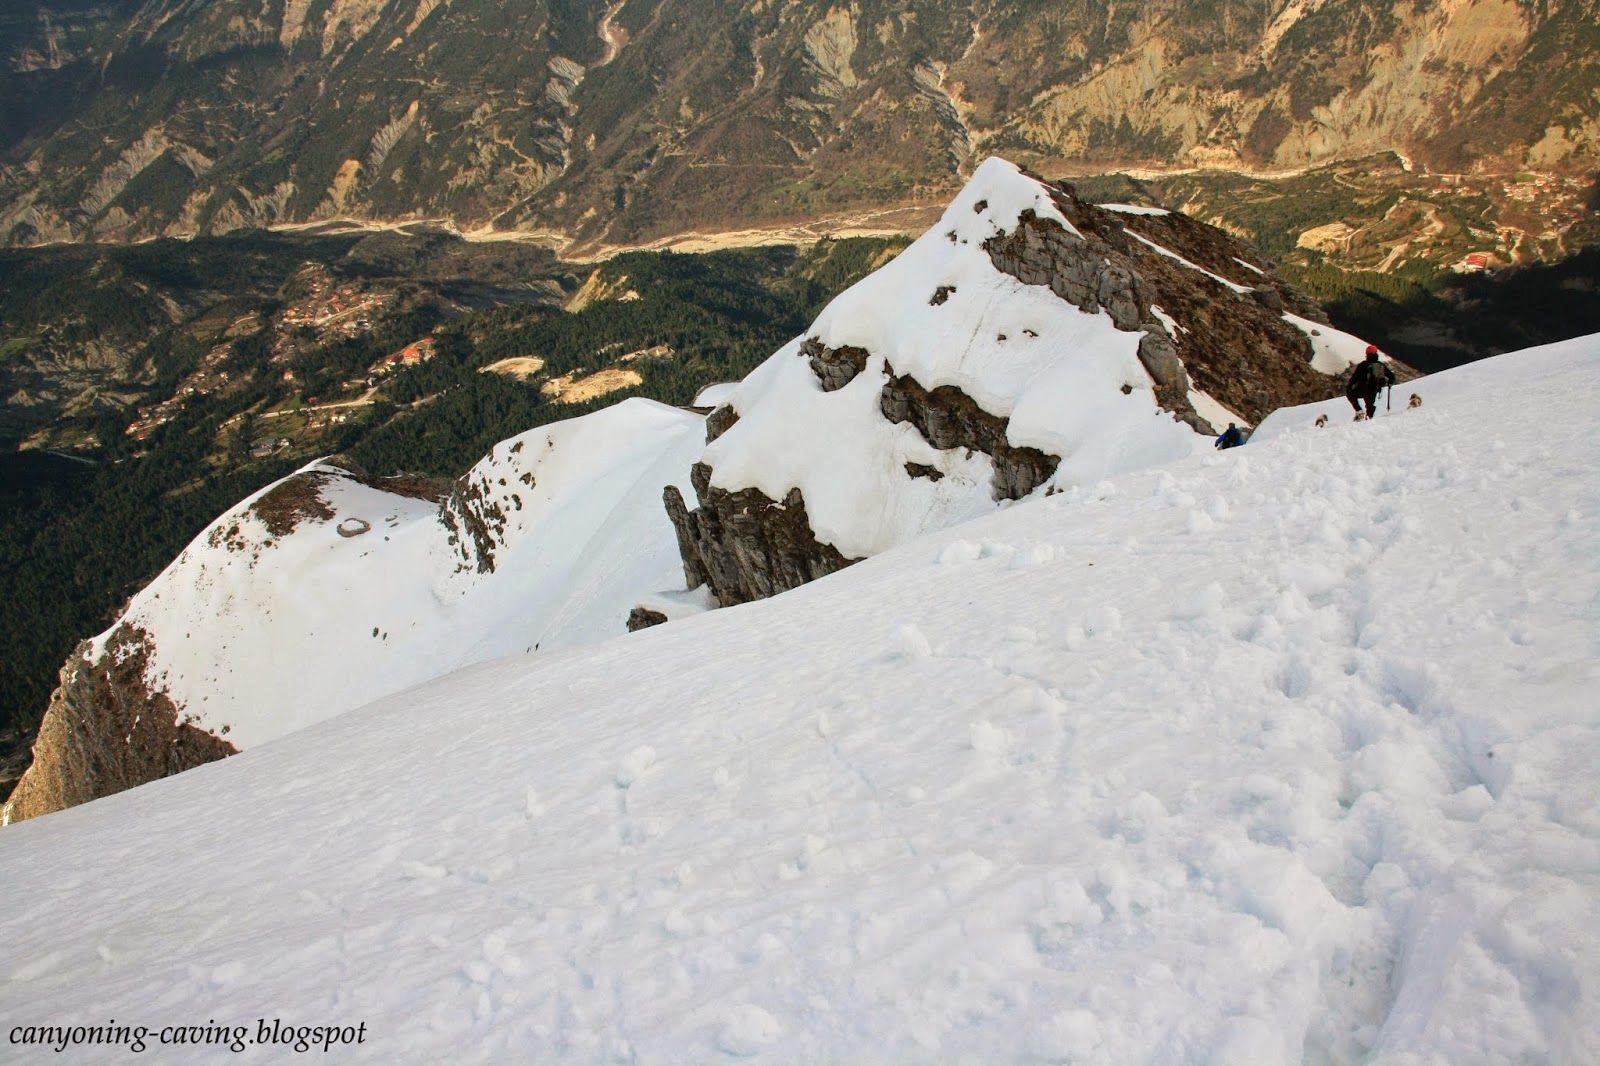 Descenting from Stroggoula peak at winter